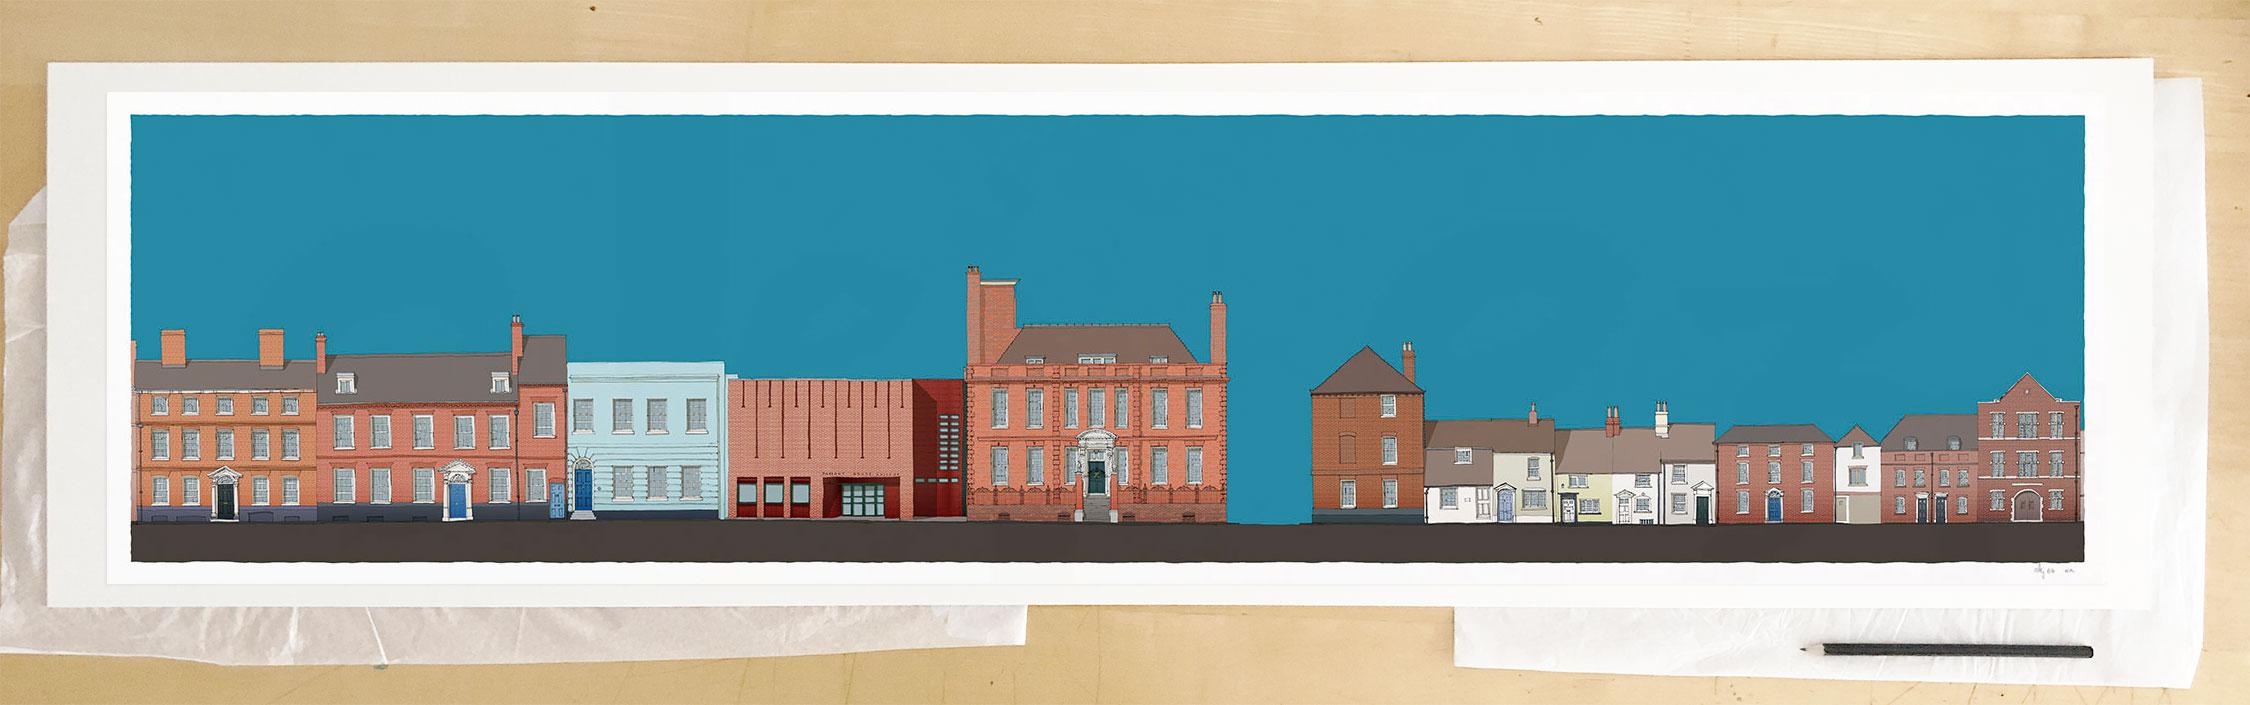 Fine art print by UK artist alej ez titled Pallant House Gallery Cerulean Blue